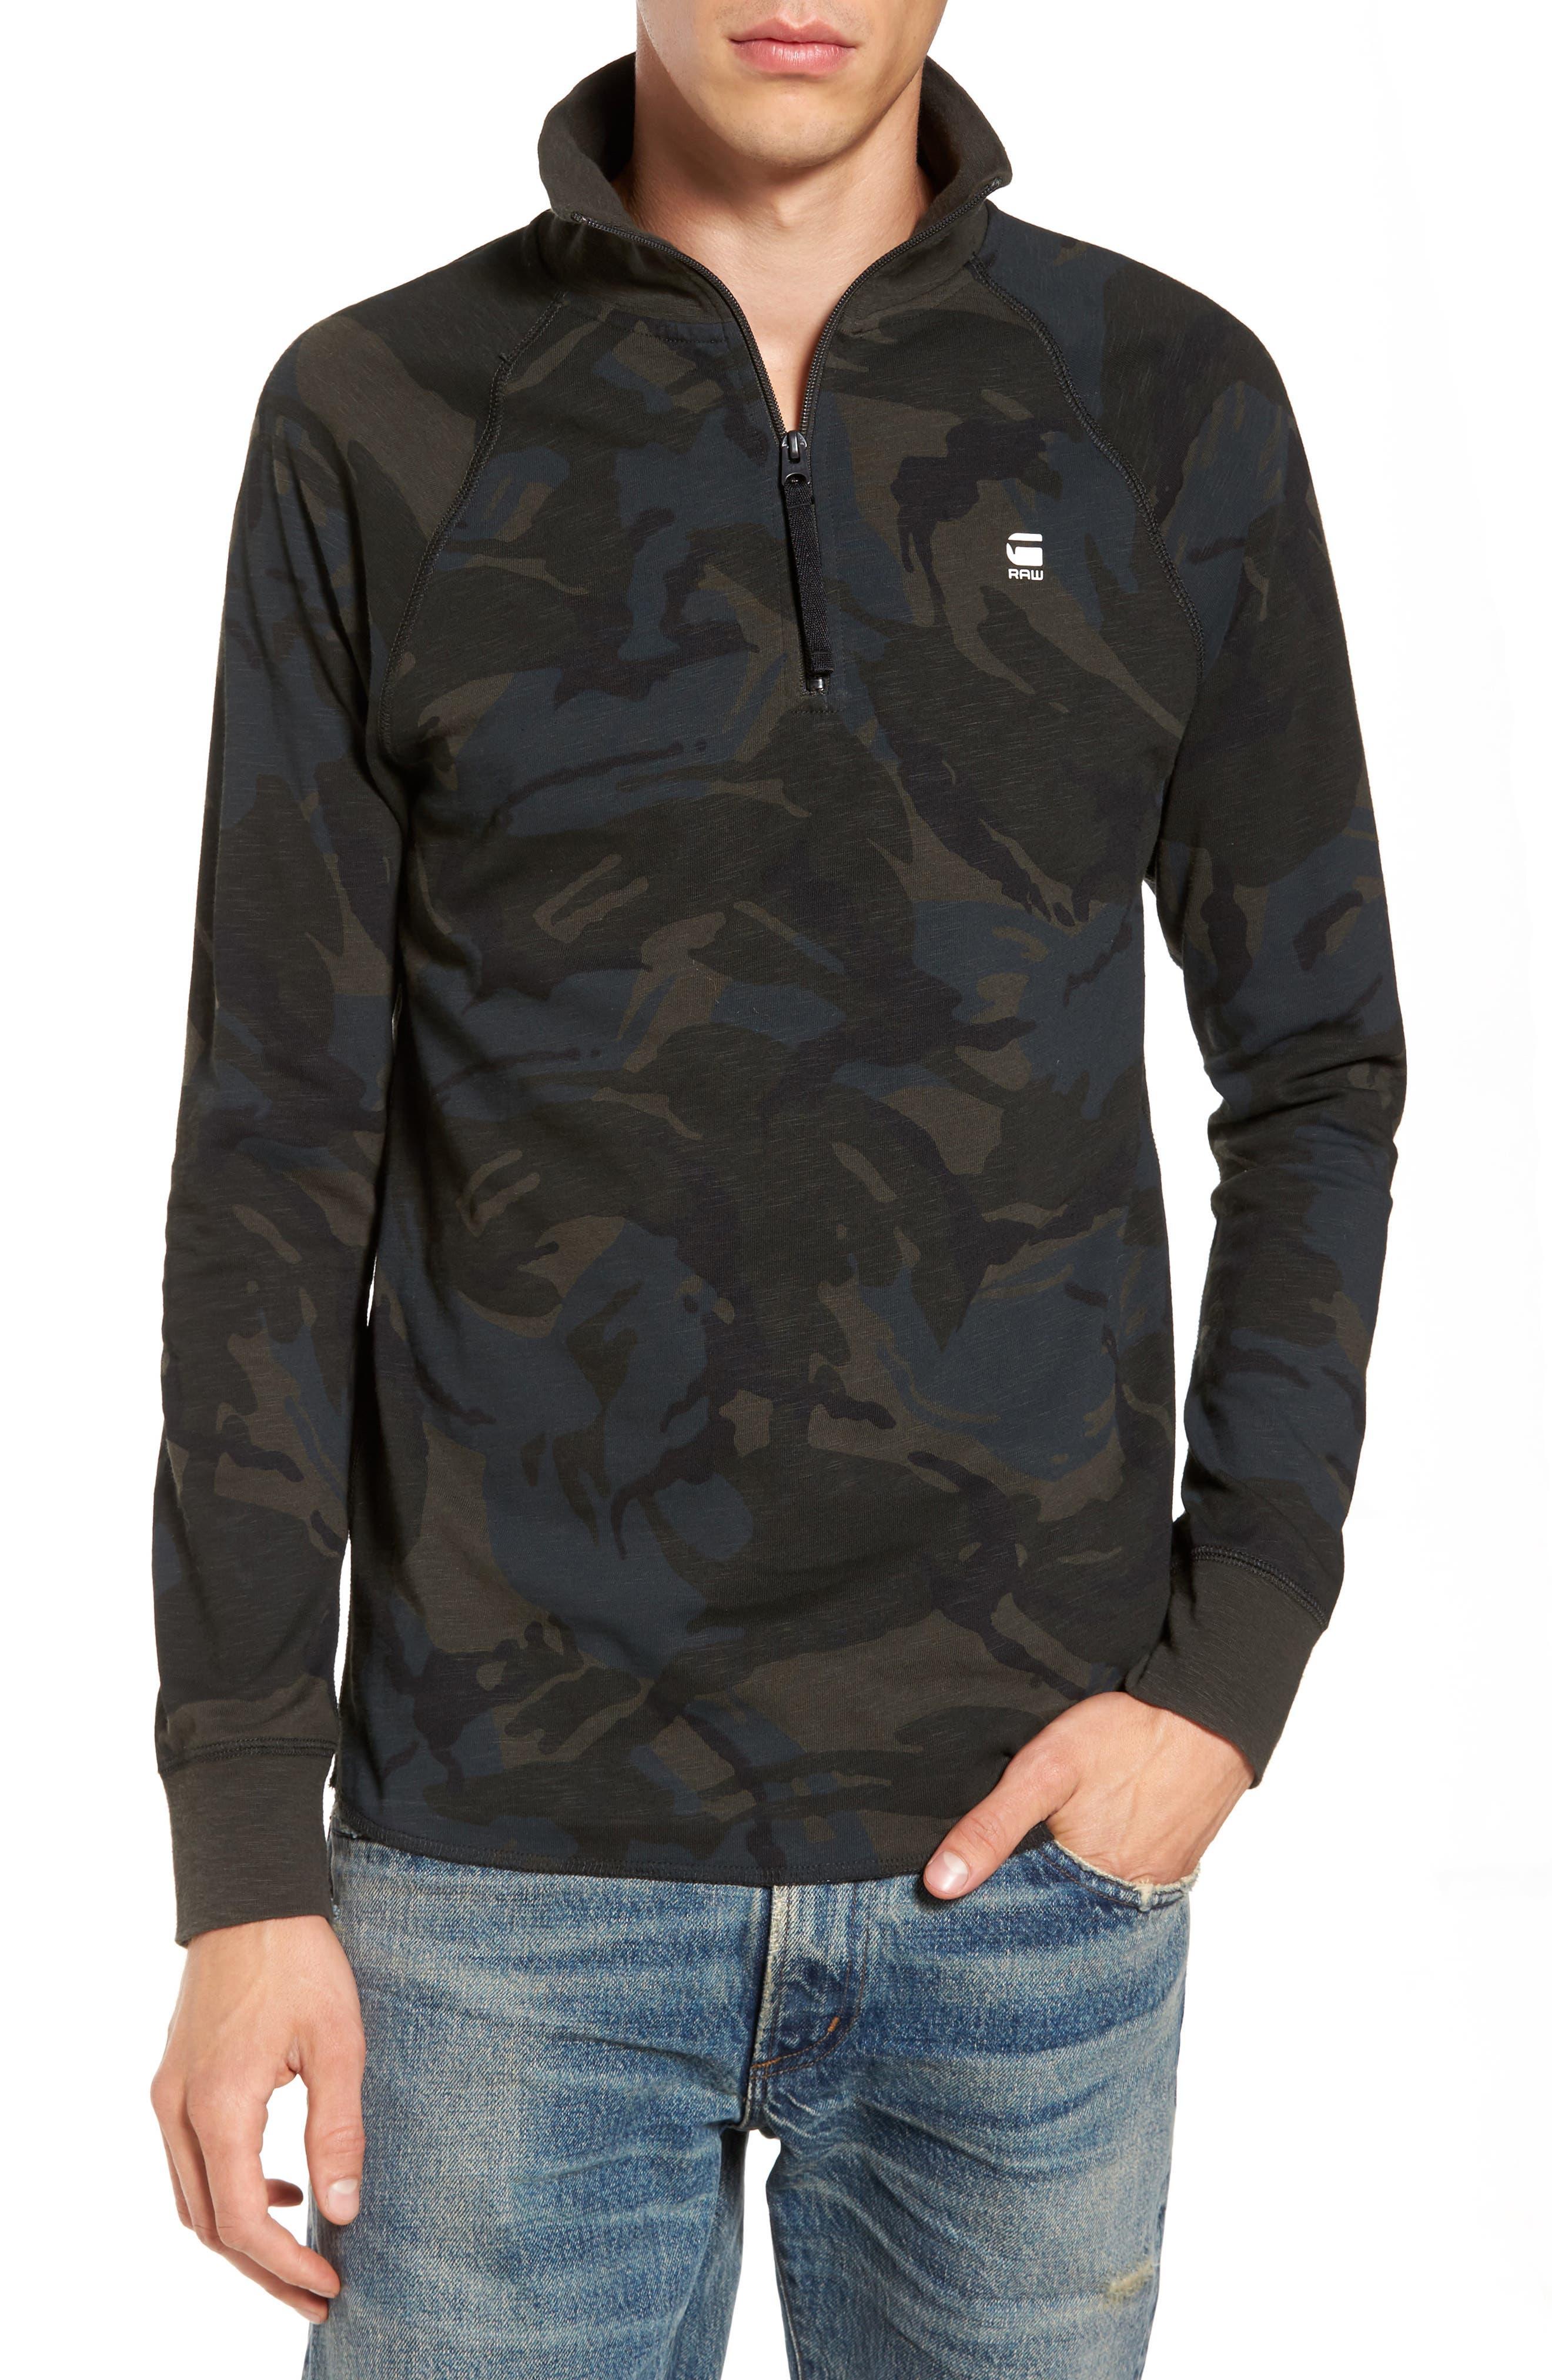 G-Star Raw Jirgi Quarter Zip Jacket